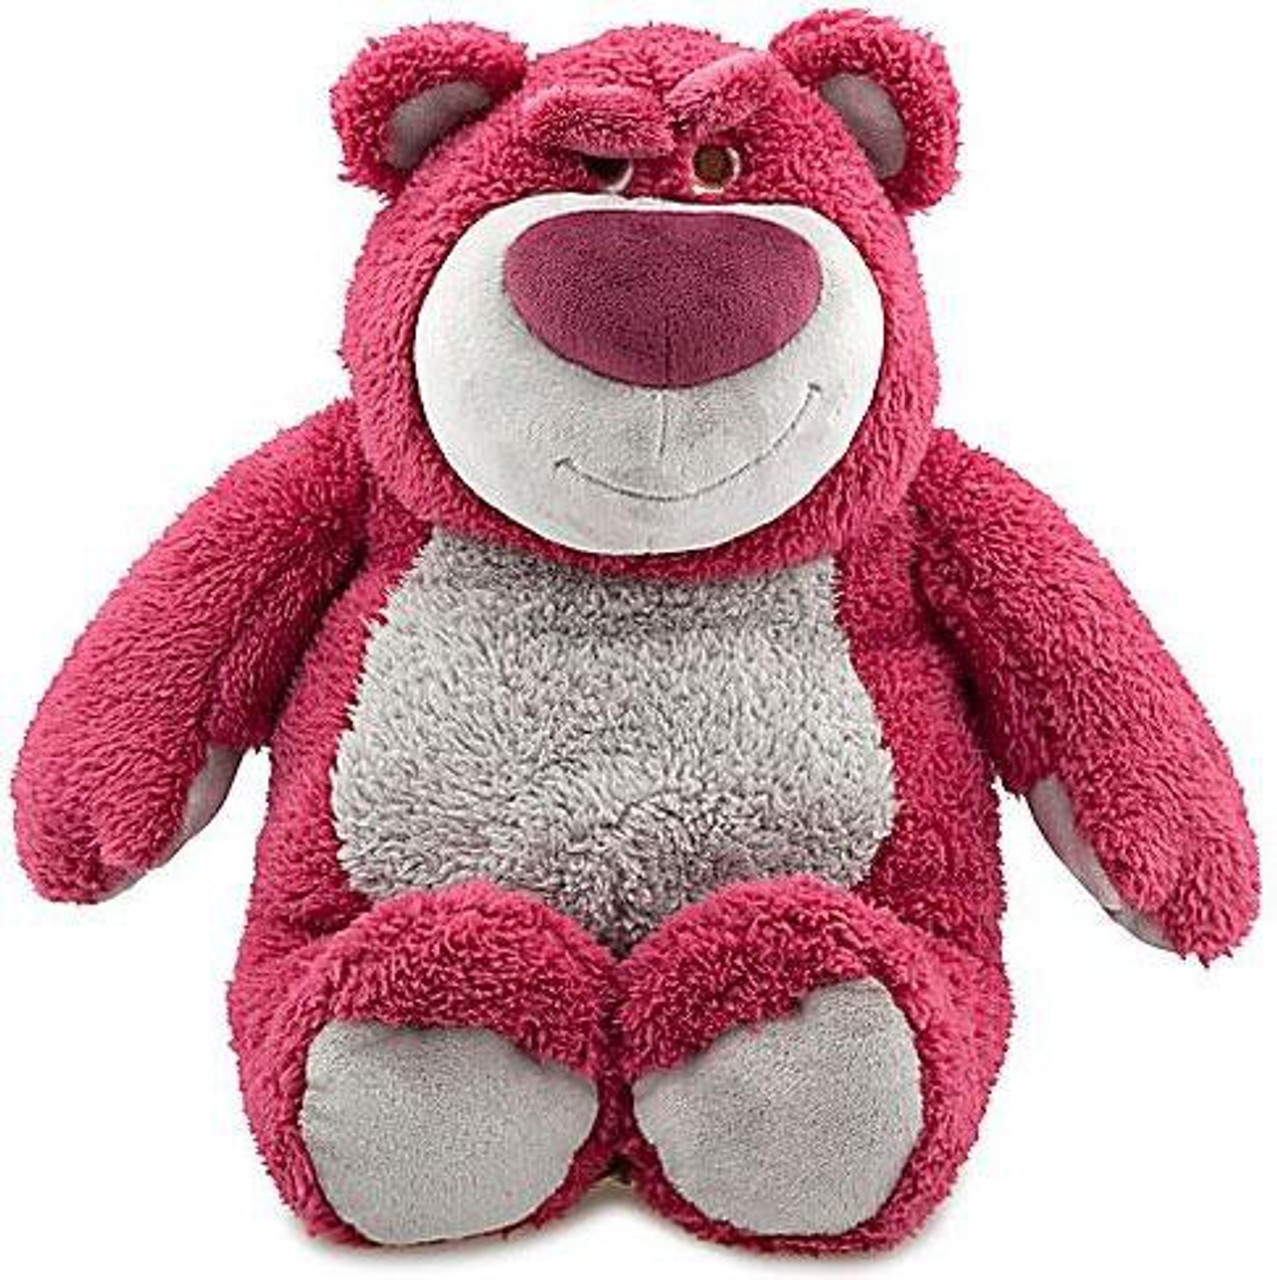 Goo Goo Moving Wobbly Googly Eyes Soft Toy Teddy Doll Making  FAST DISPATCH